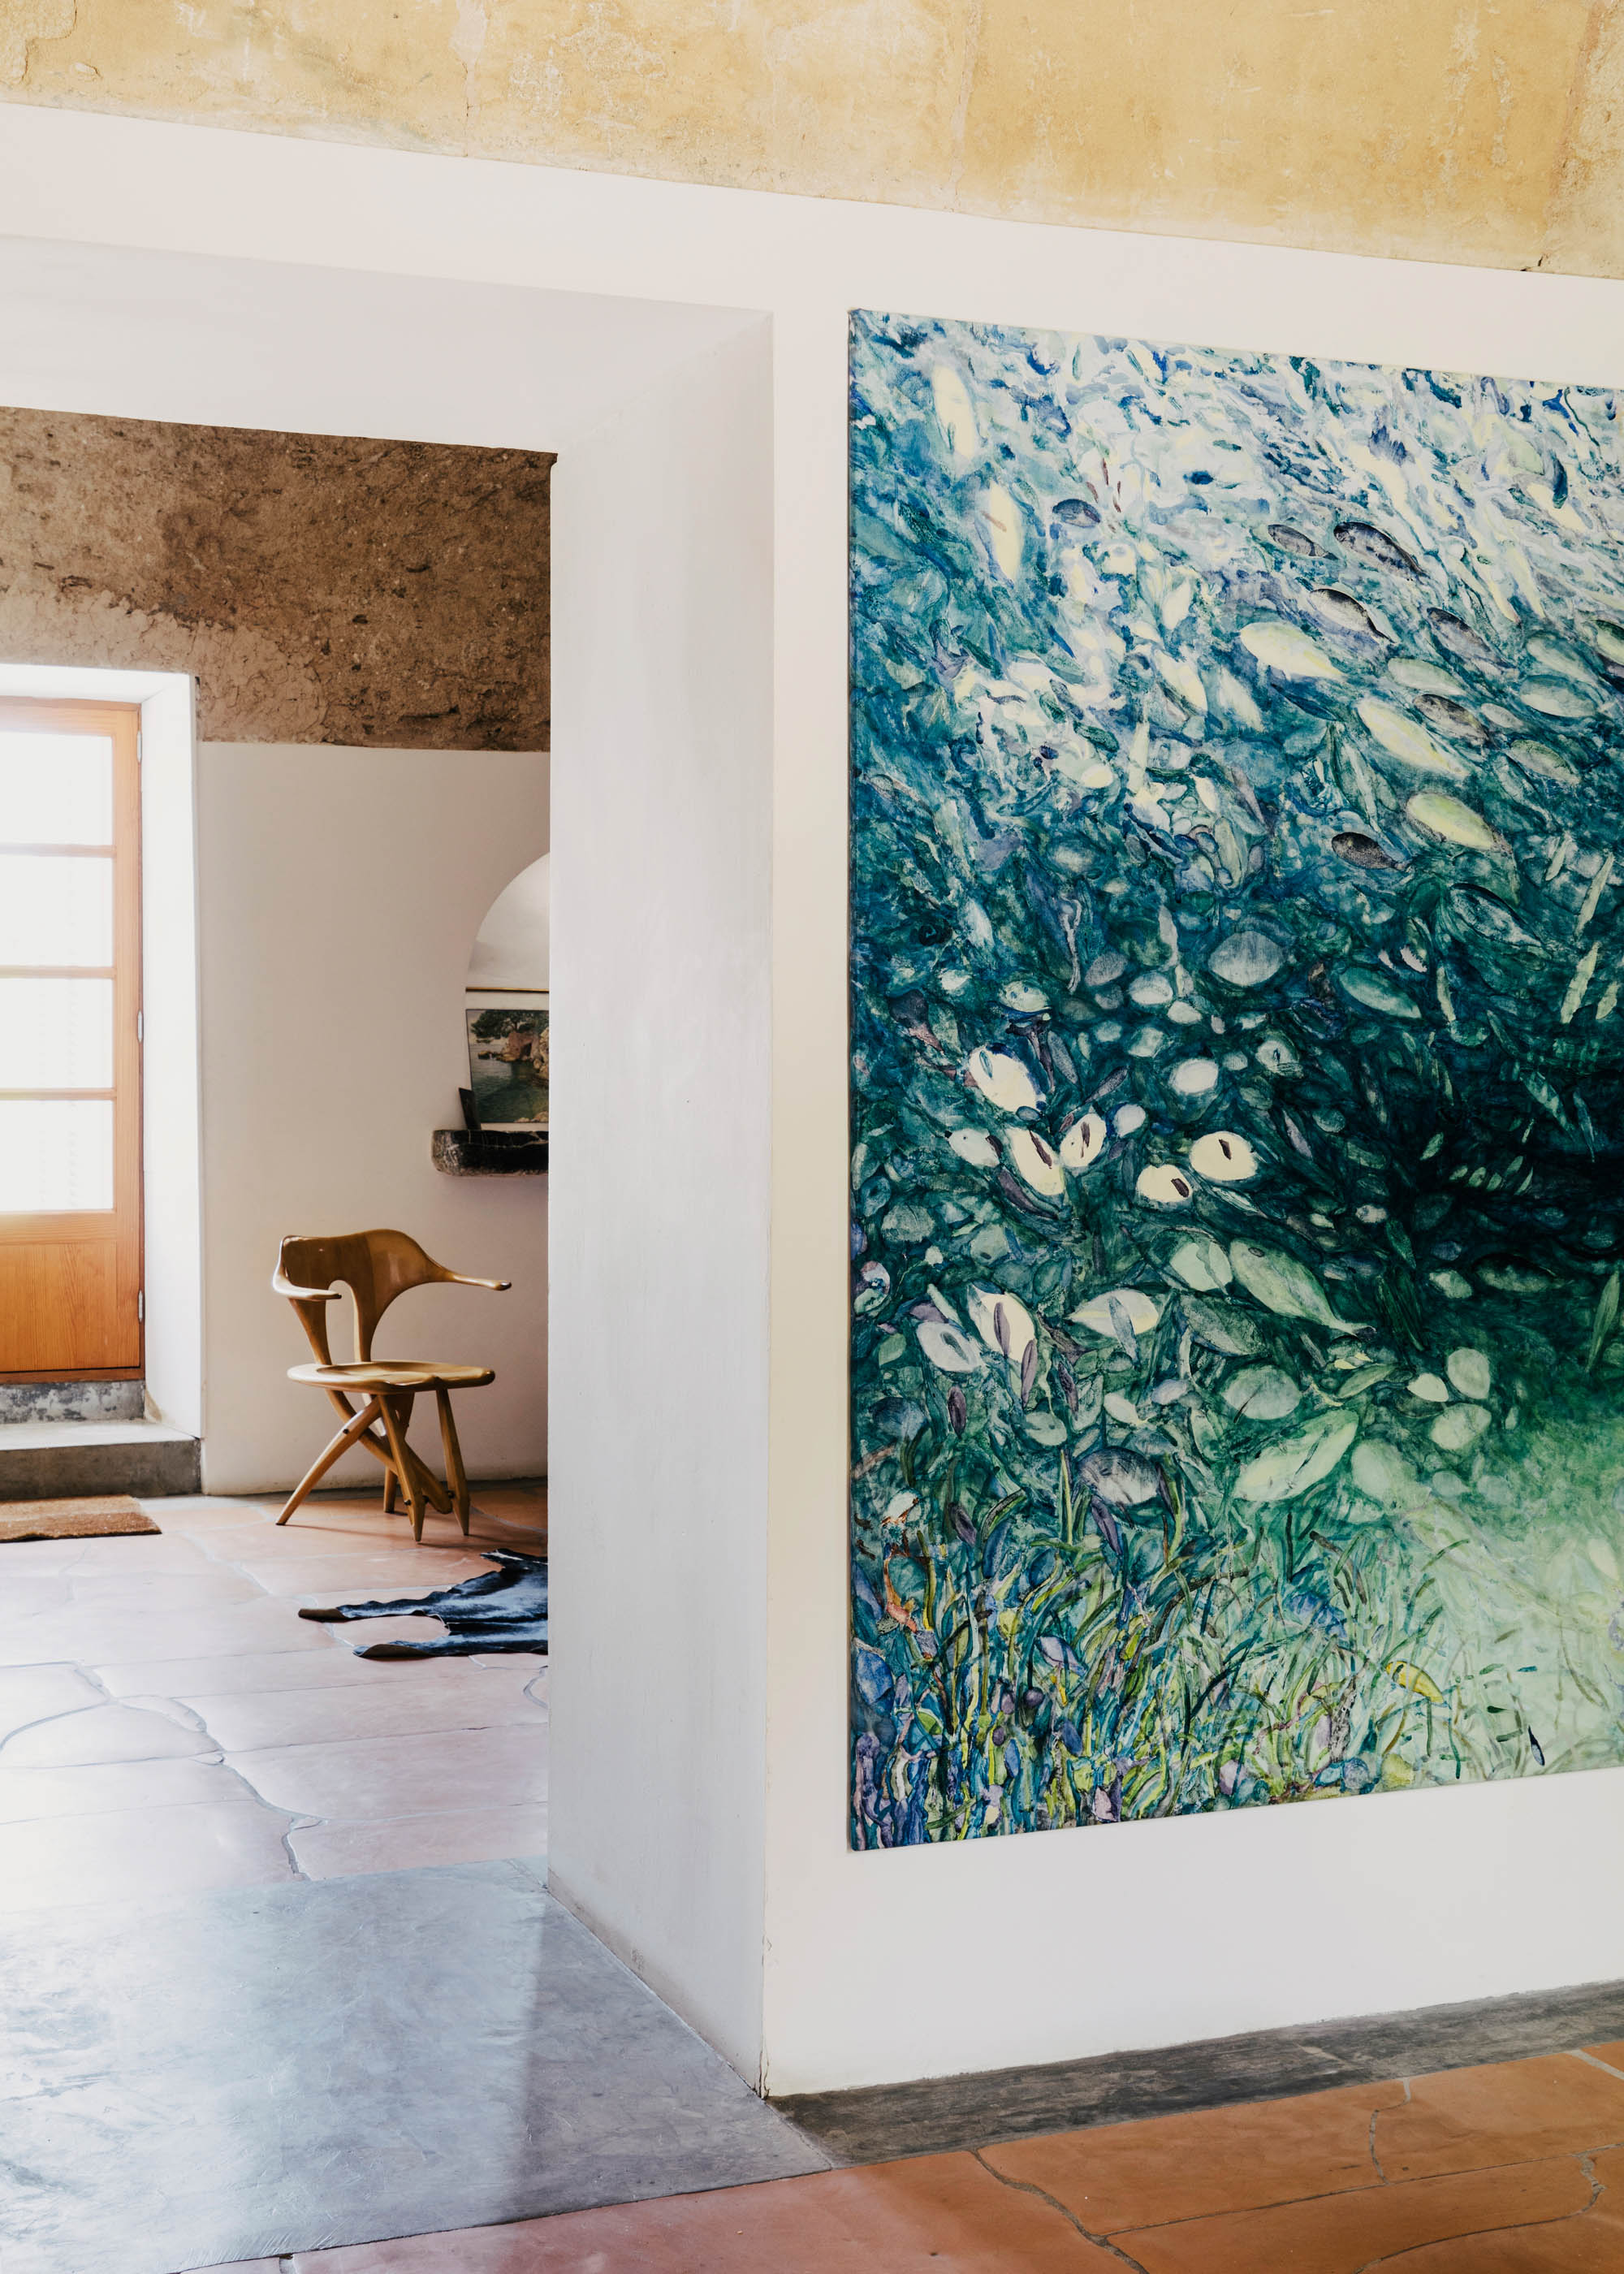 #interiors #miquel #barcelo #artist #spain #mallorca #editorial #wallstreetjournal